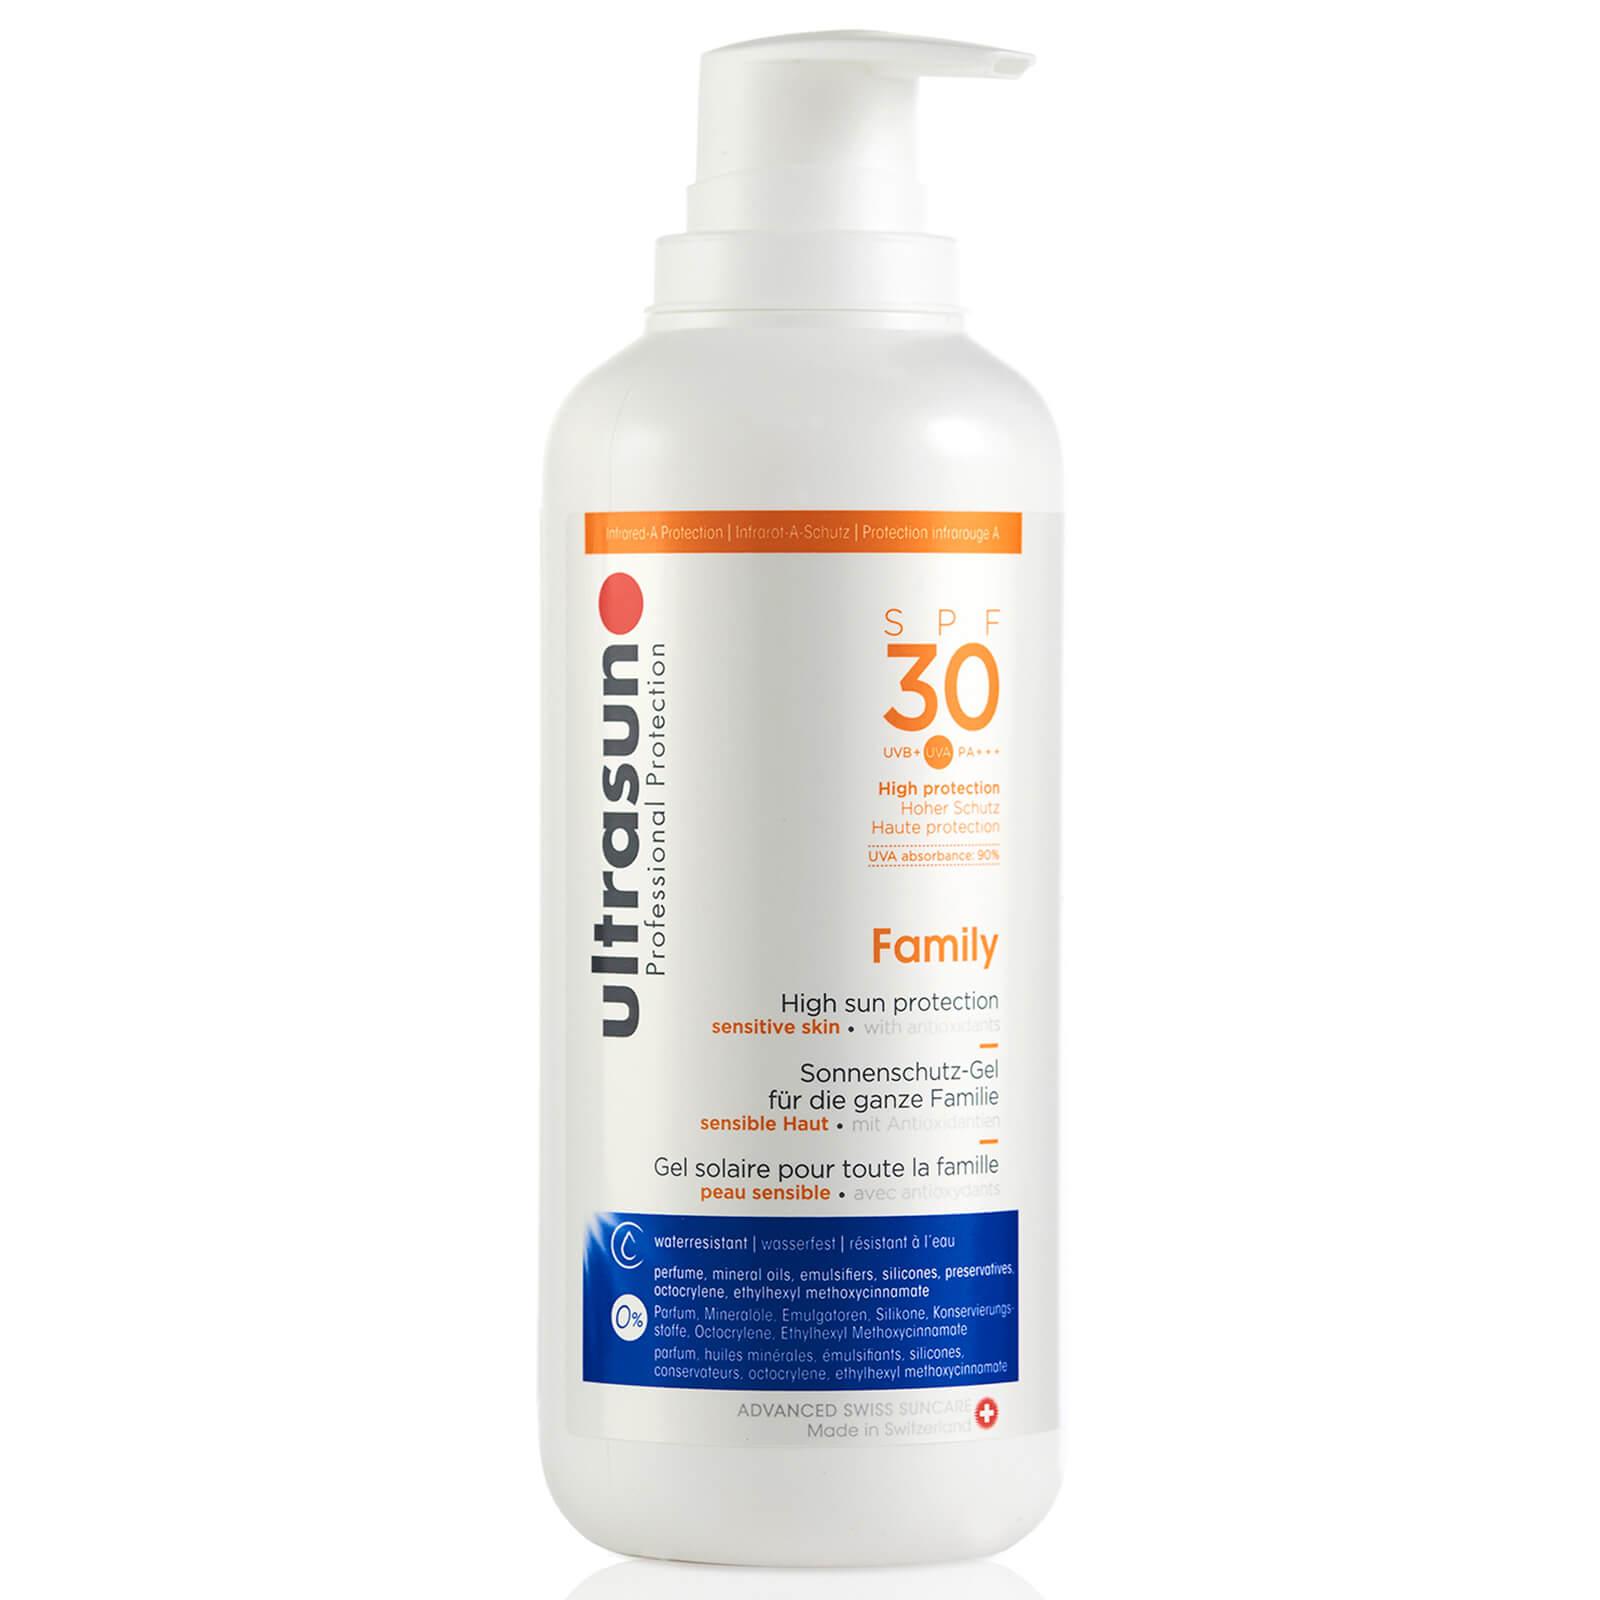 【Ultrasun】瑞士防晒霜SPF30大瓶装400ml现在40%OFF